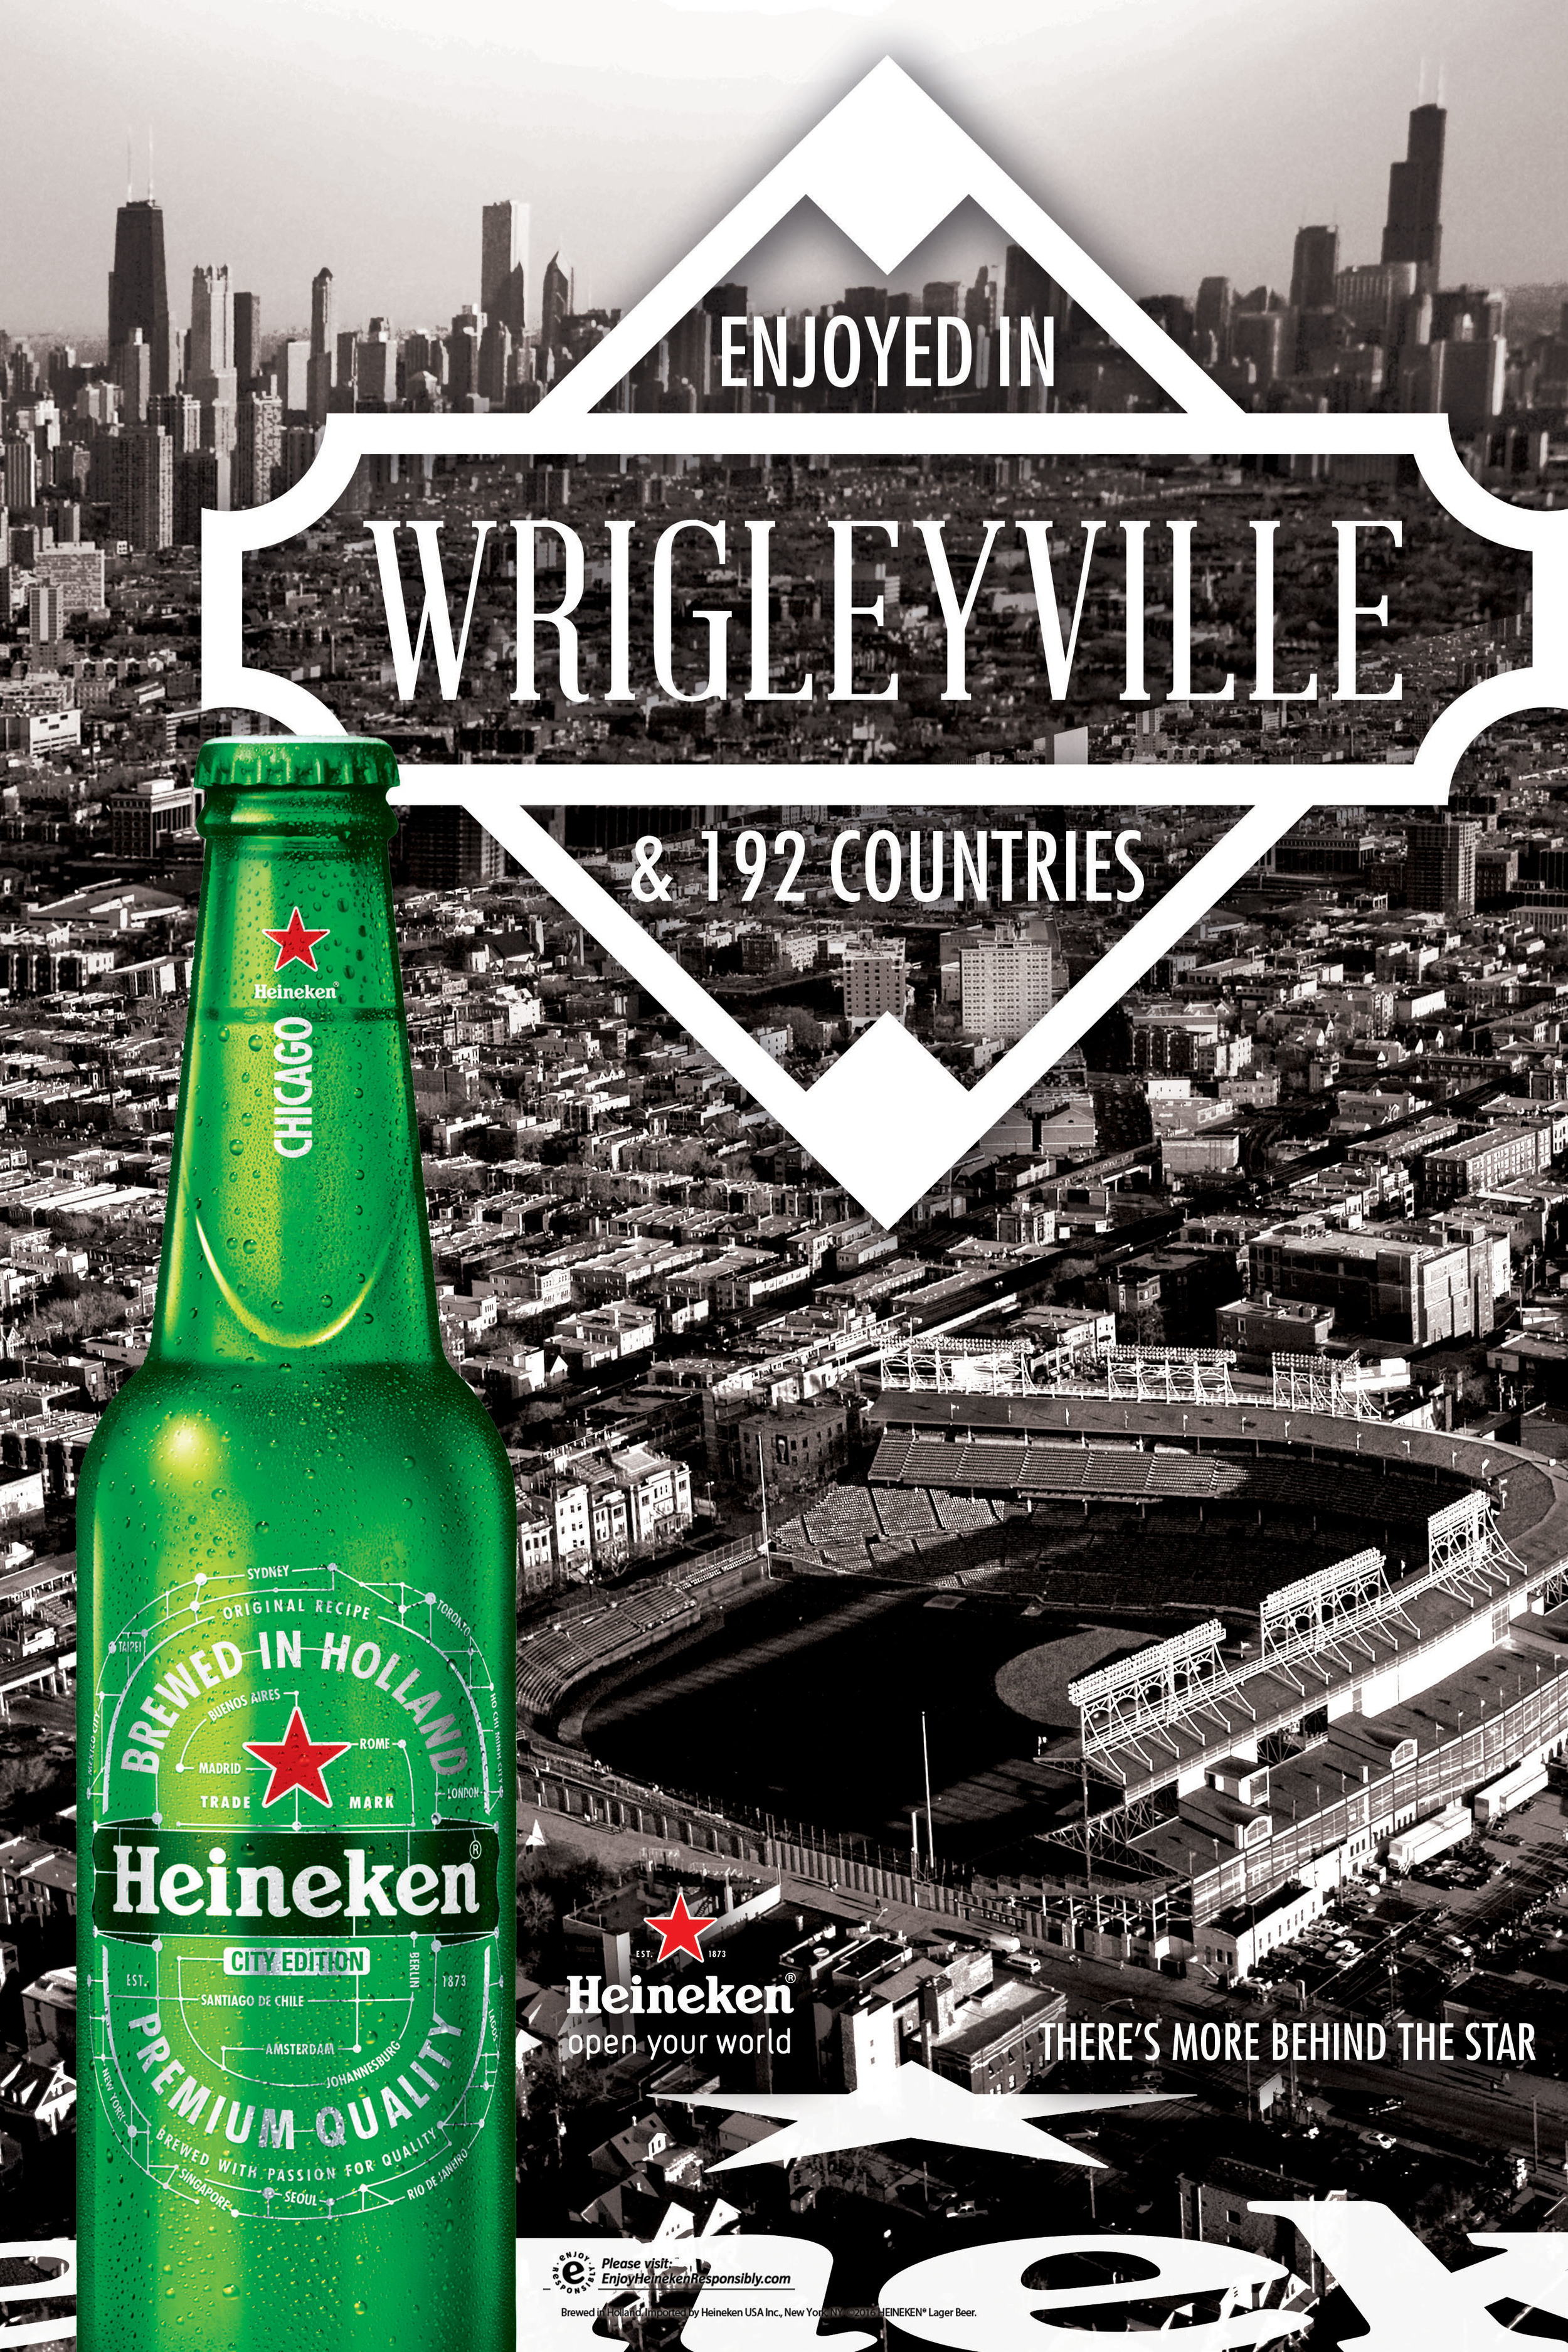 Wrigleyville